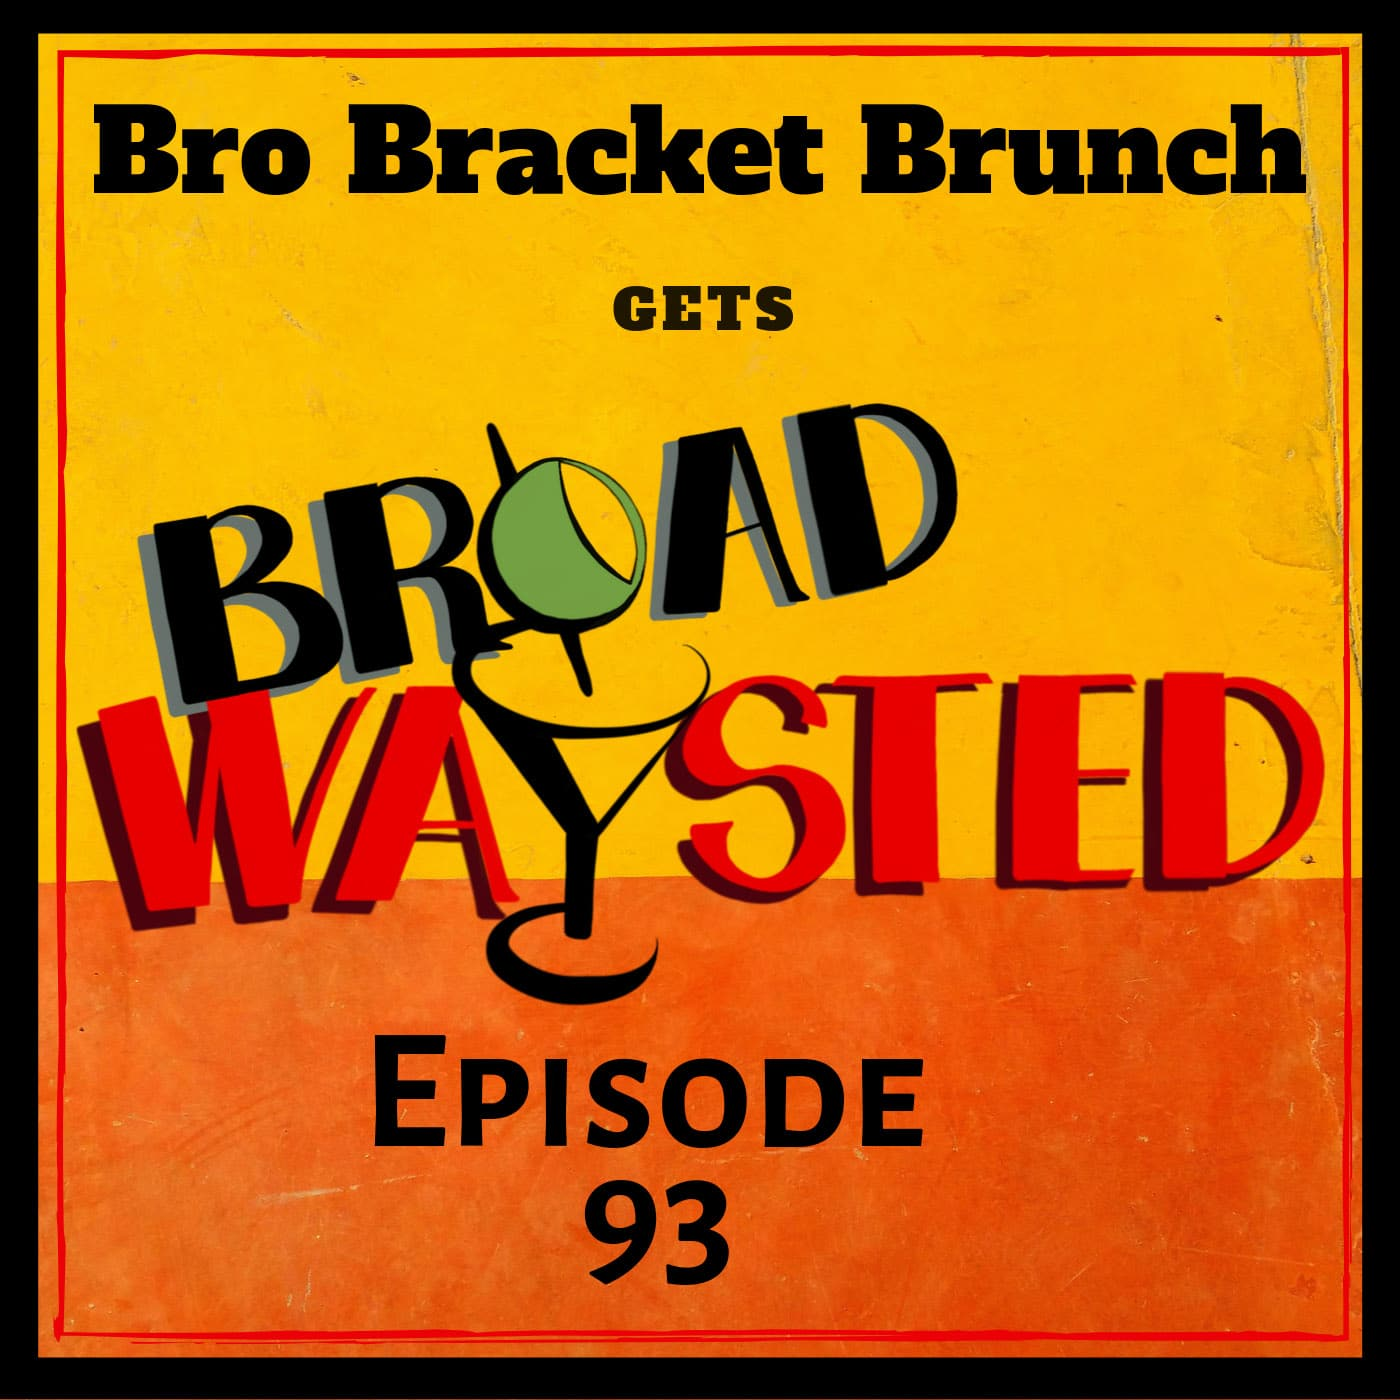 Broadwaysted Ep 93 Bro Bracket Brunch